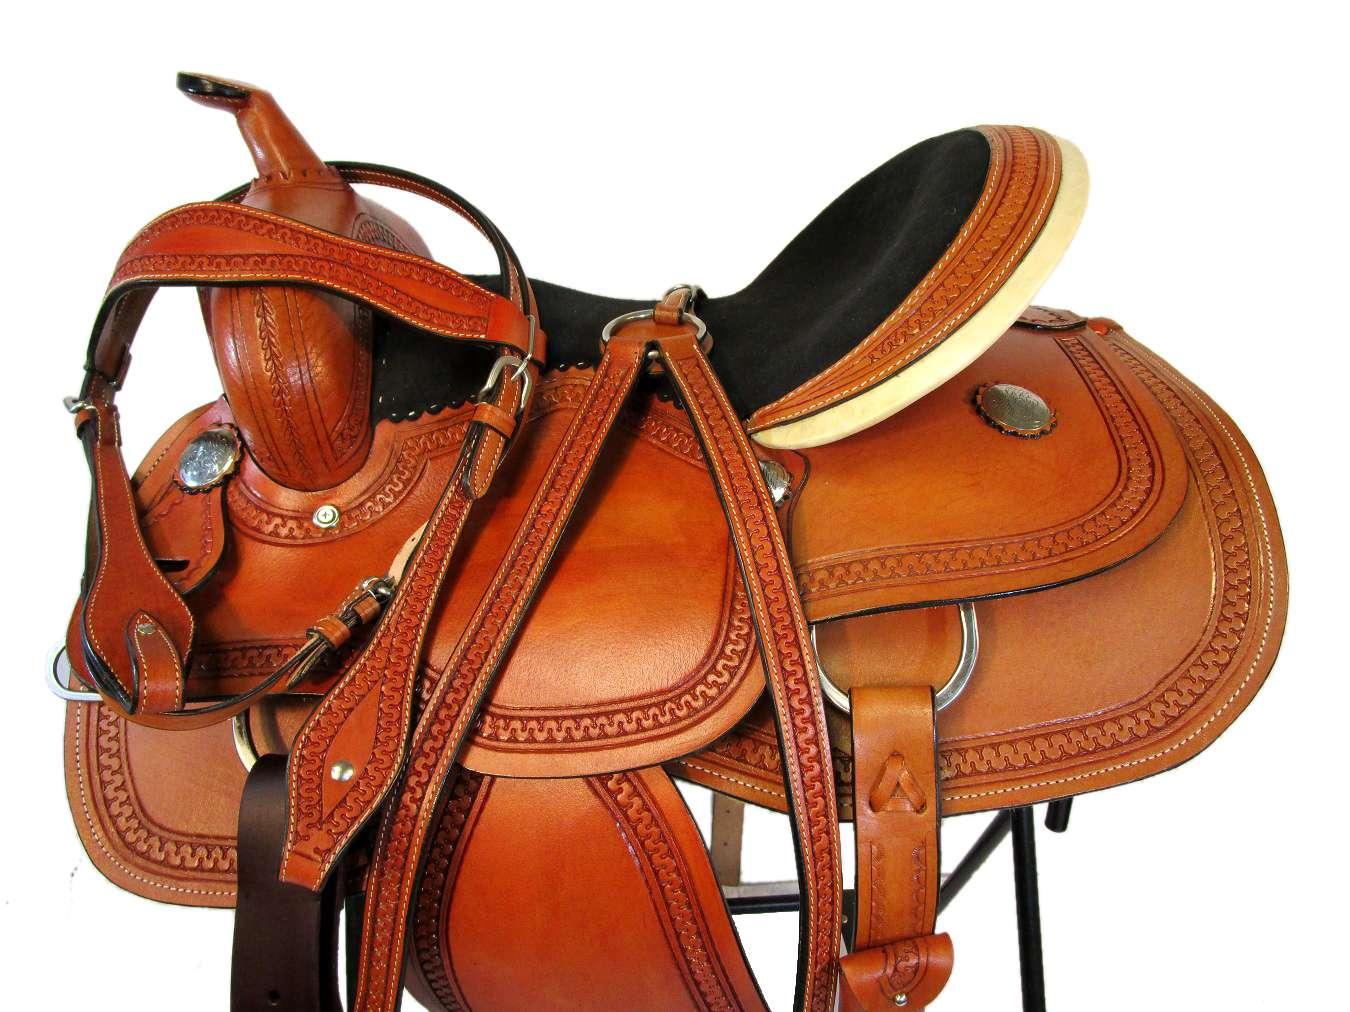 15 16 Arabian Horse Western Saddle Pleasure Leather Horse Barrel Trail Tack Set Ebay